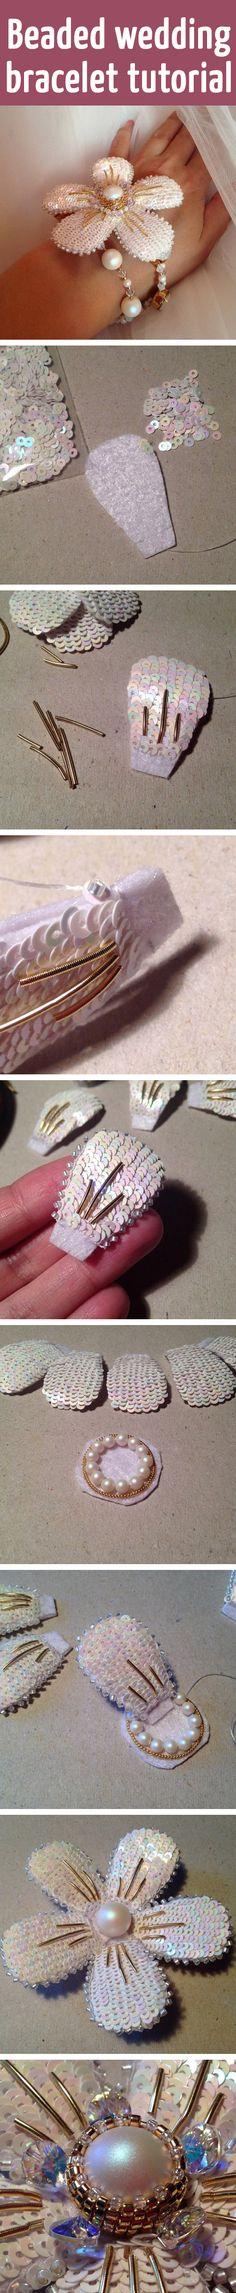 Beaded wedding bracelet tutorial